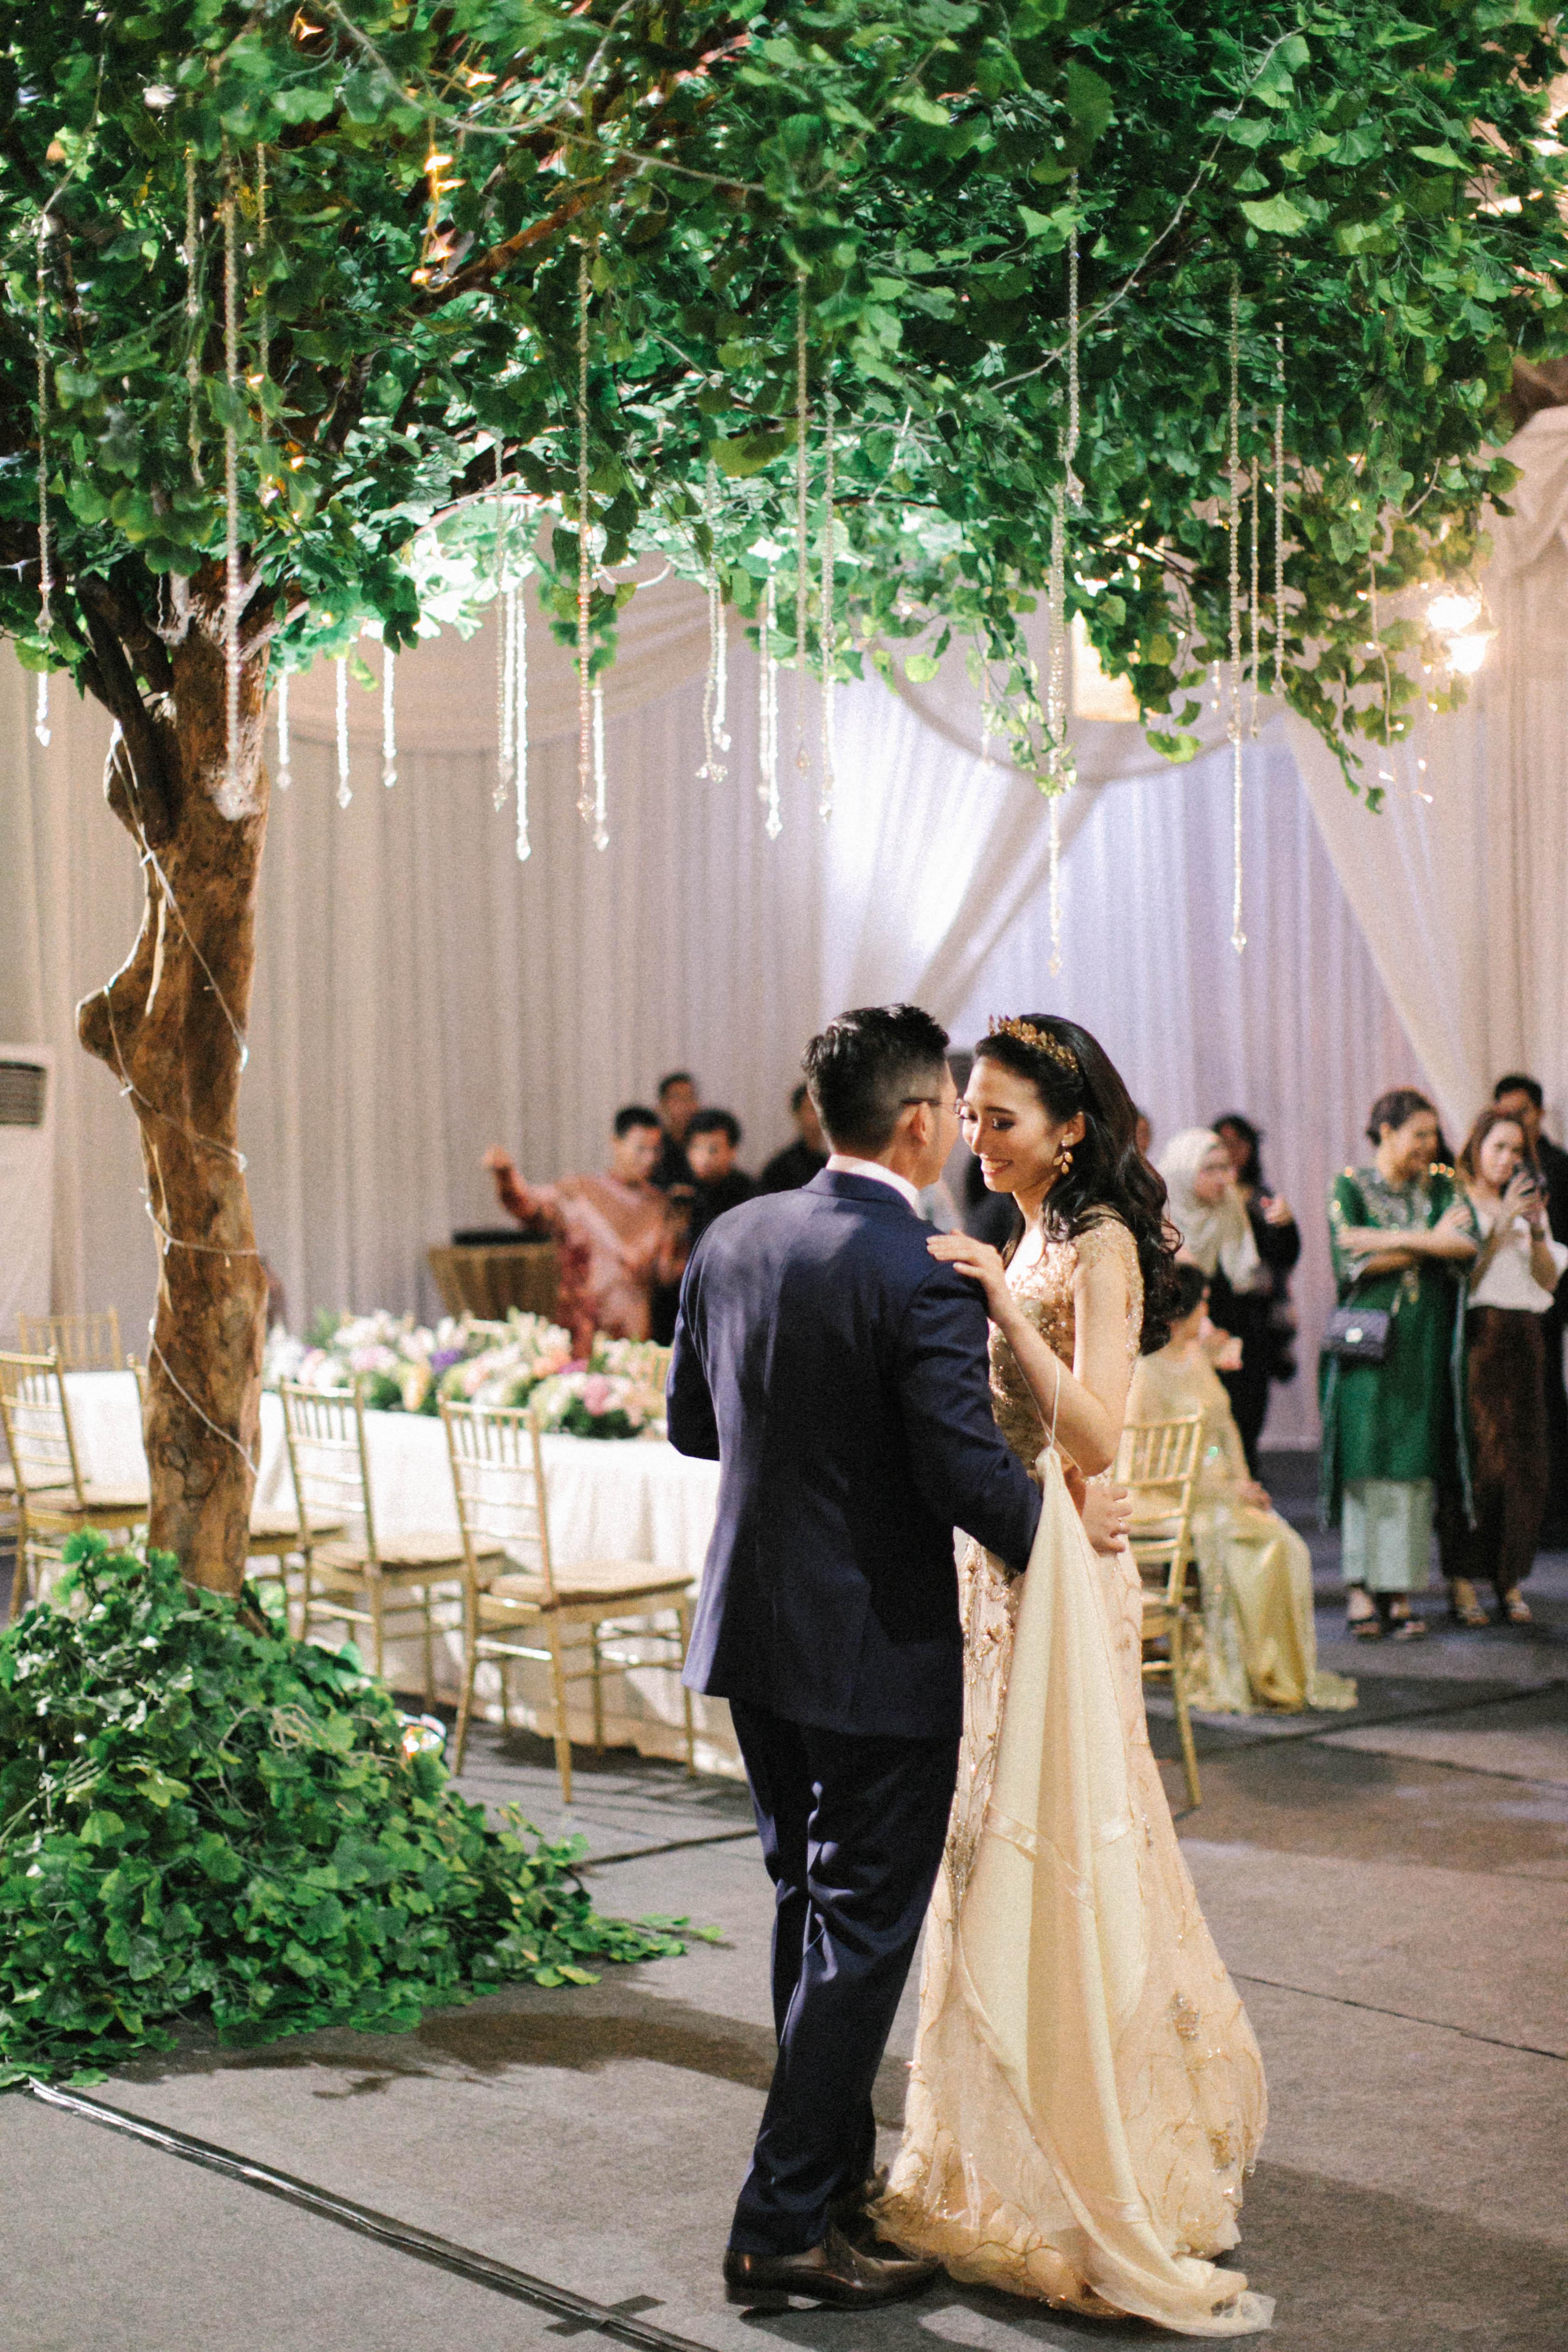 wedding reception bride groom first dance under tree lighting